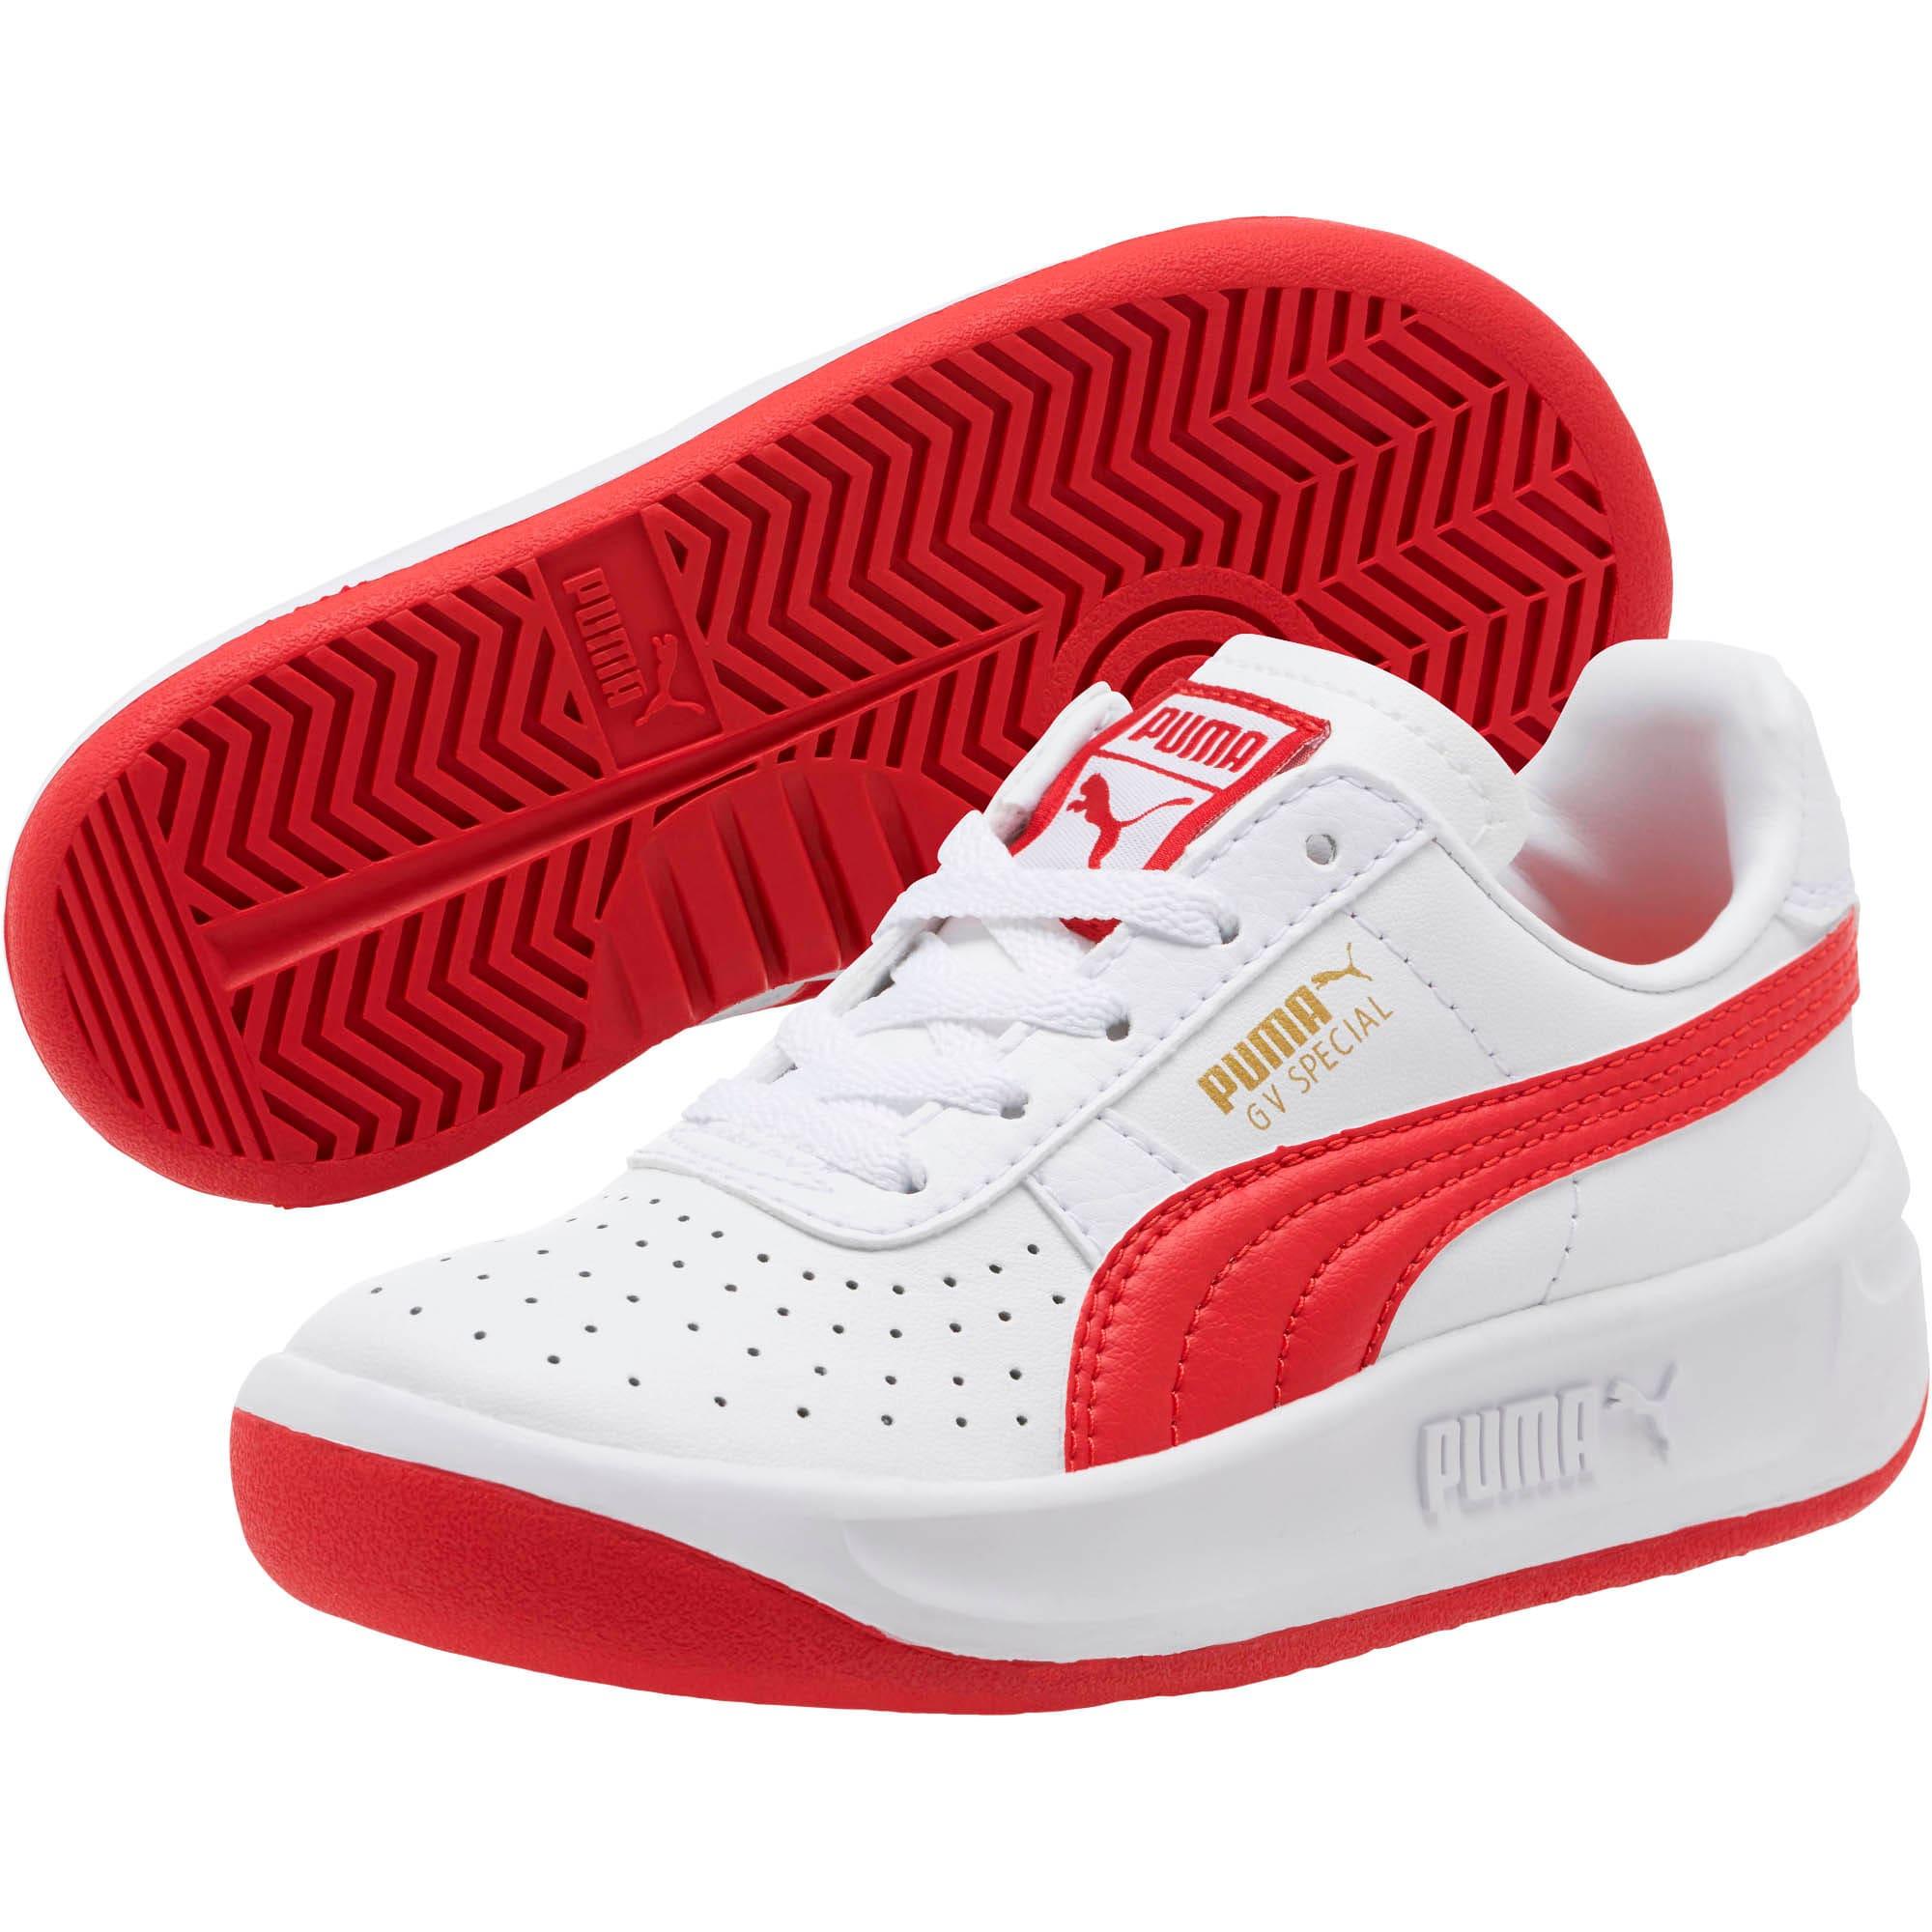 Thumbnail 2 of GV Special Little Kids' Shoes, Puma White-Ribbon Red, medium